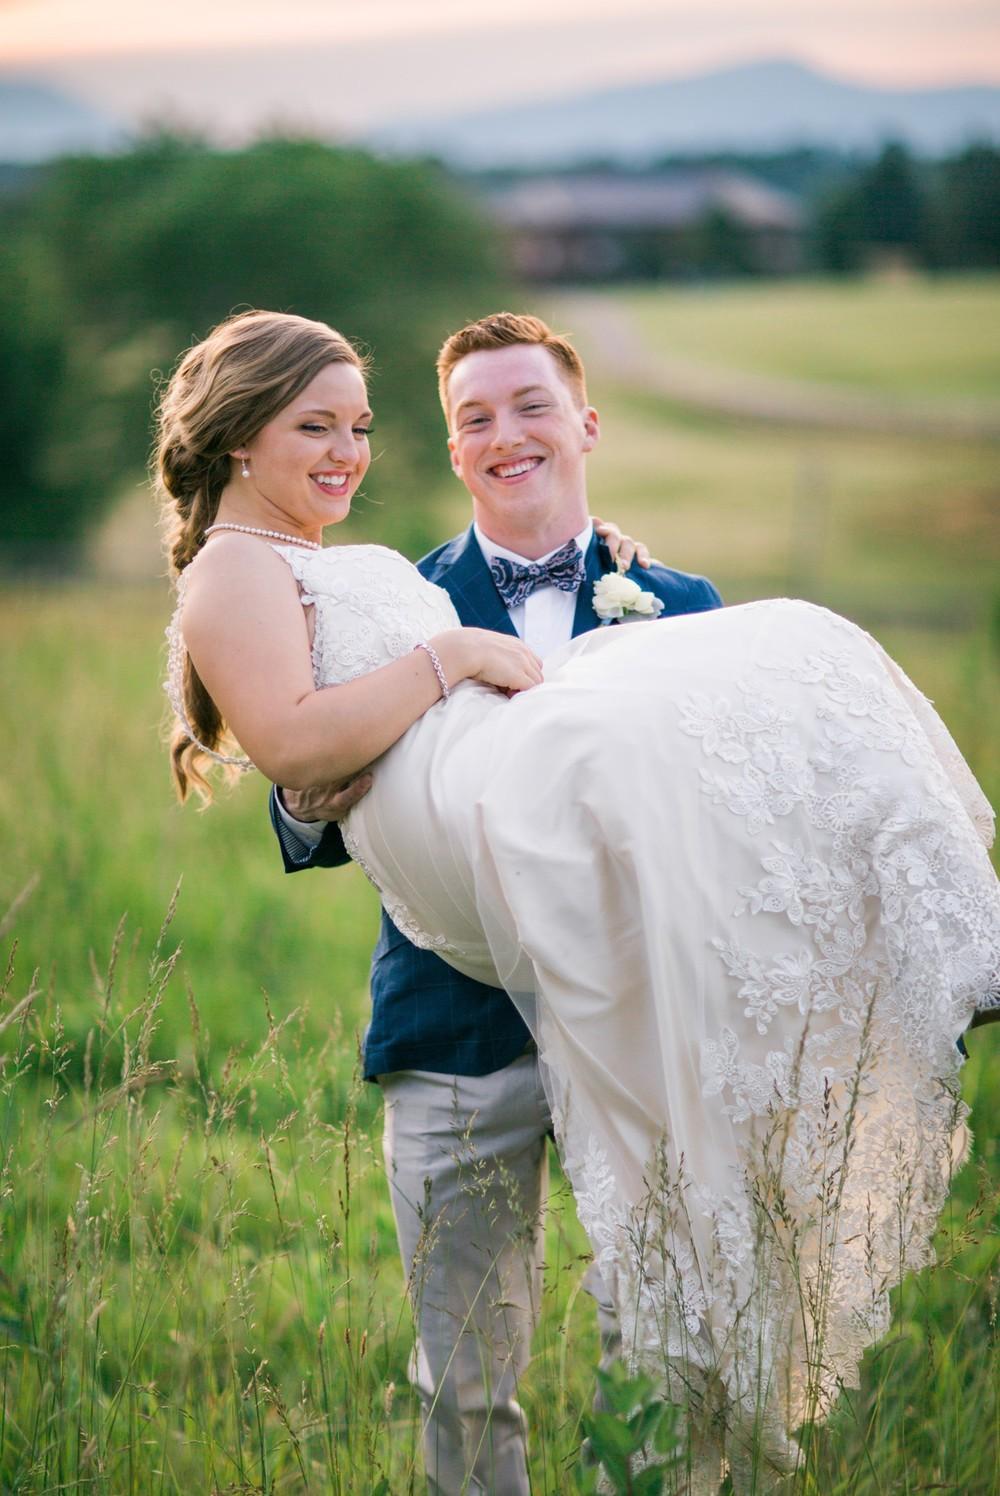 trivium_lynchburg_va_wedding_estate_wedding_photography_wedding_photographers (83).jpg